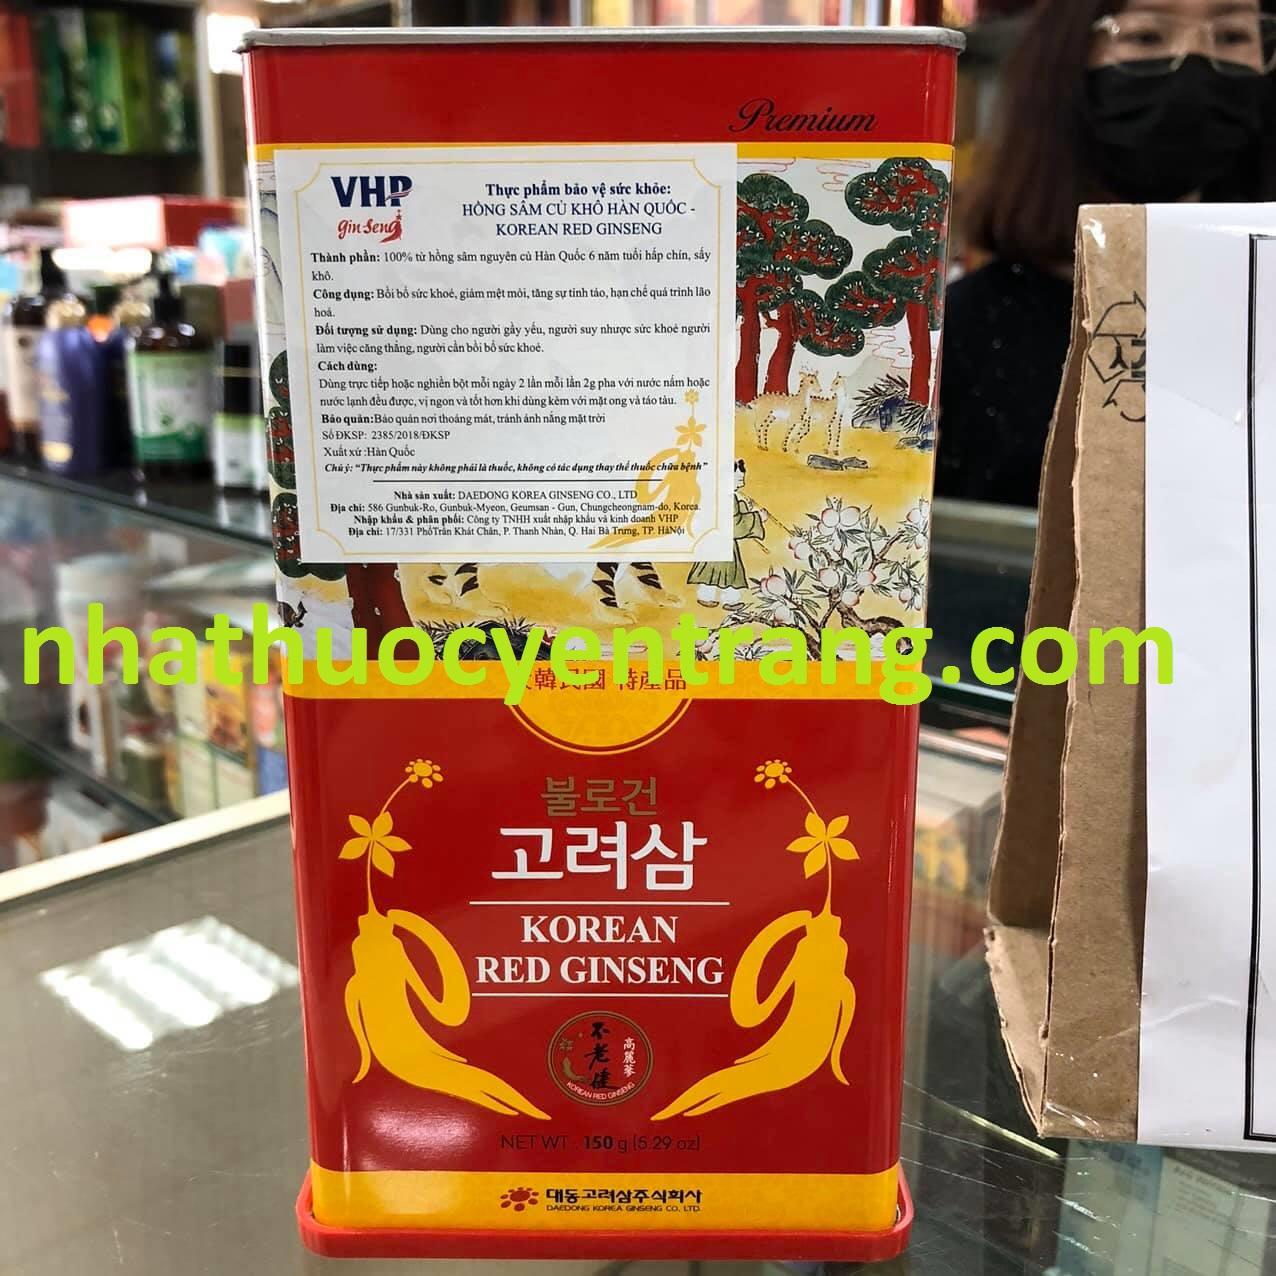 Hồng Sâm Củ Khô Korean Red Ginseng 150g Deadong